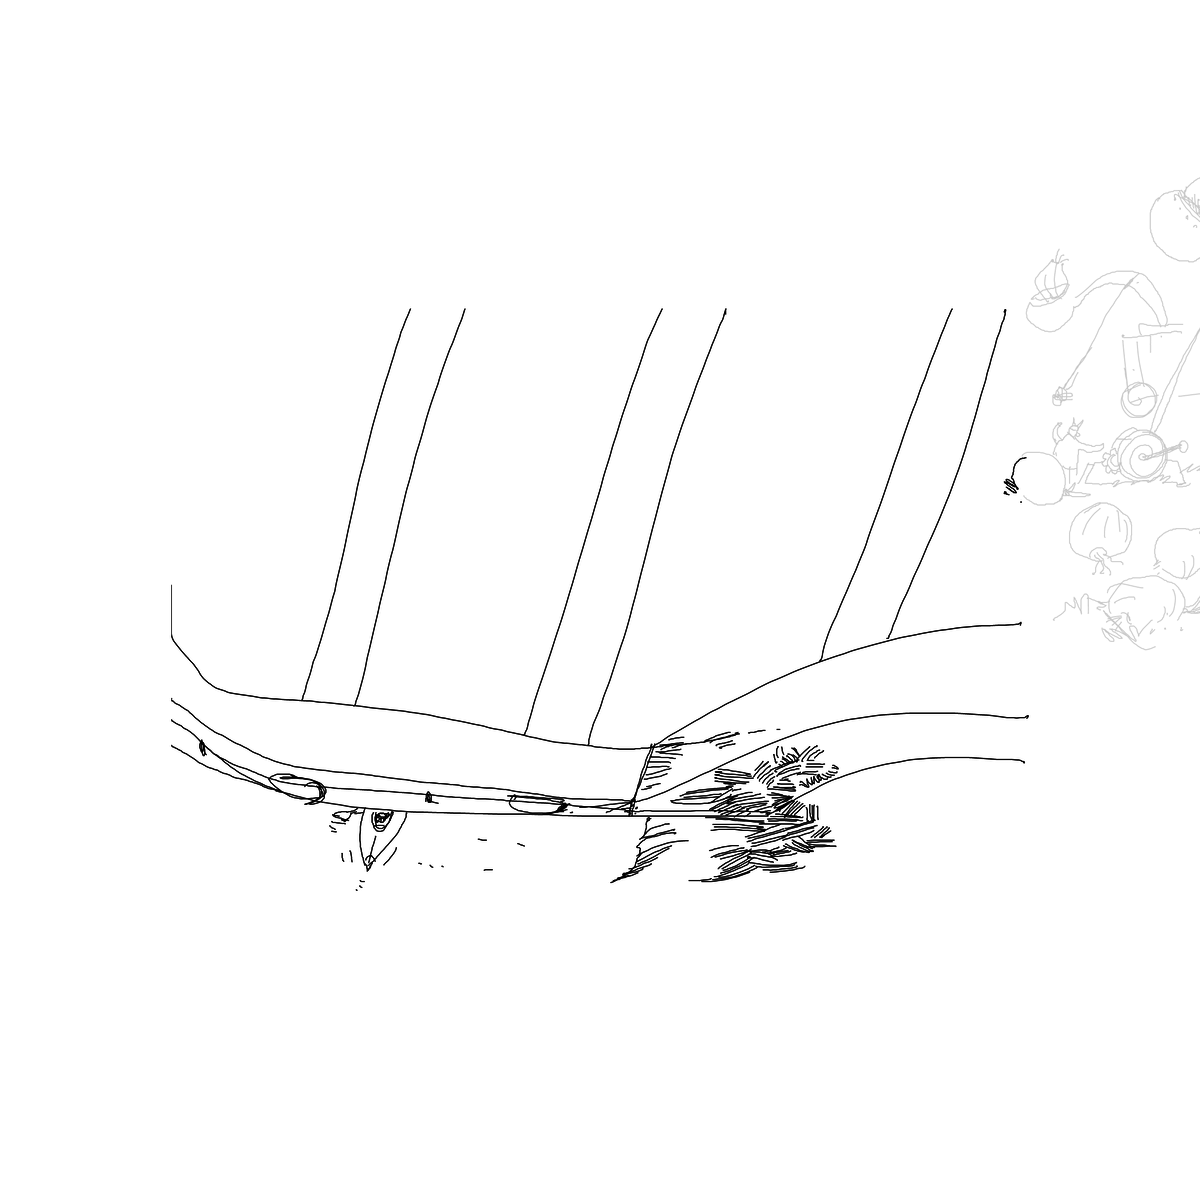 BAAAM drawing#6393 lat:78.4175872802734400lng: -4.4399352073669430